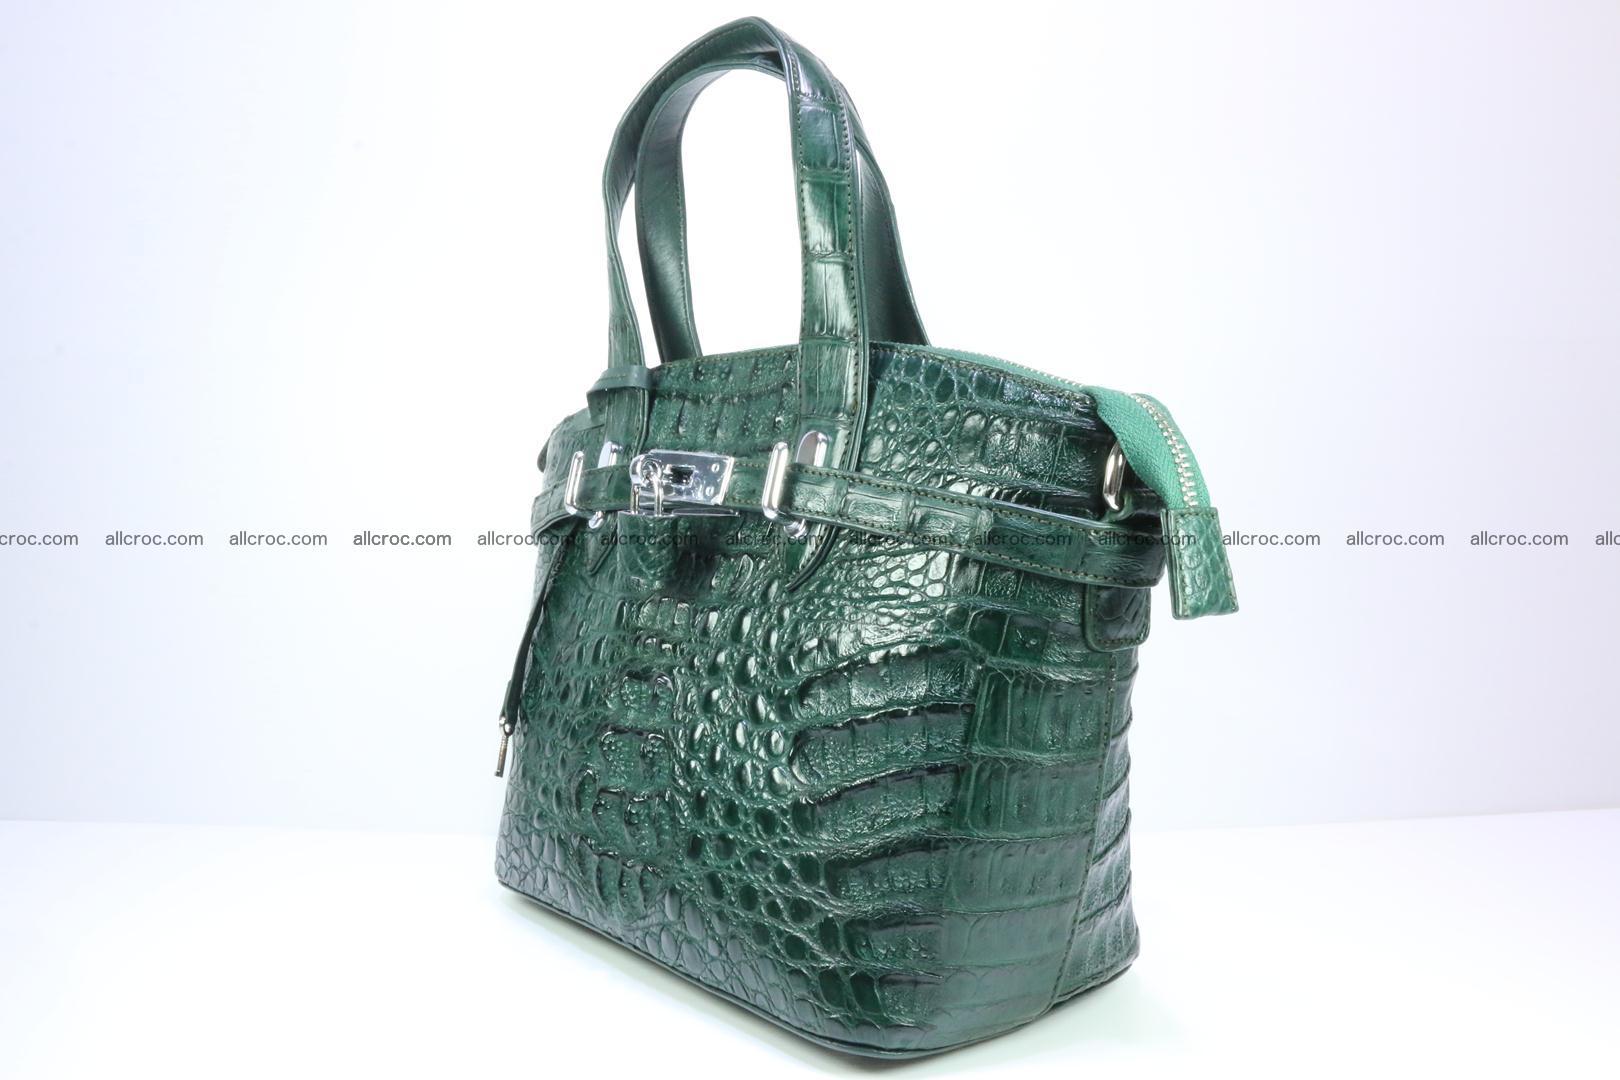 Genuine crocodile handbag for ladies 047 Foto 2